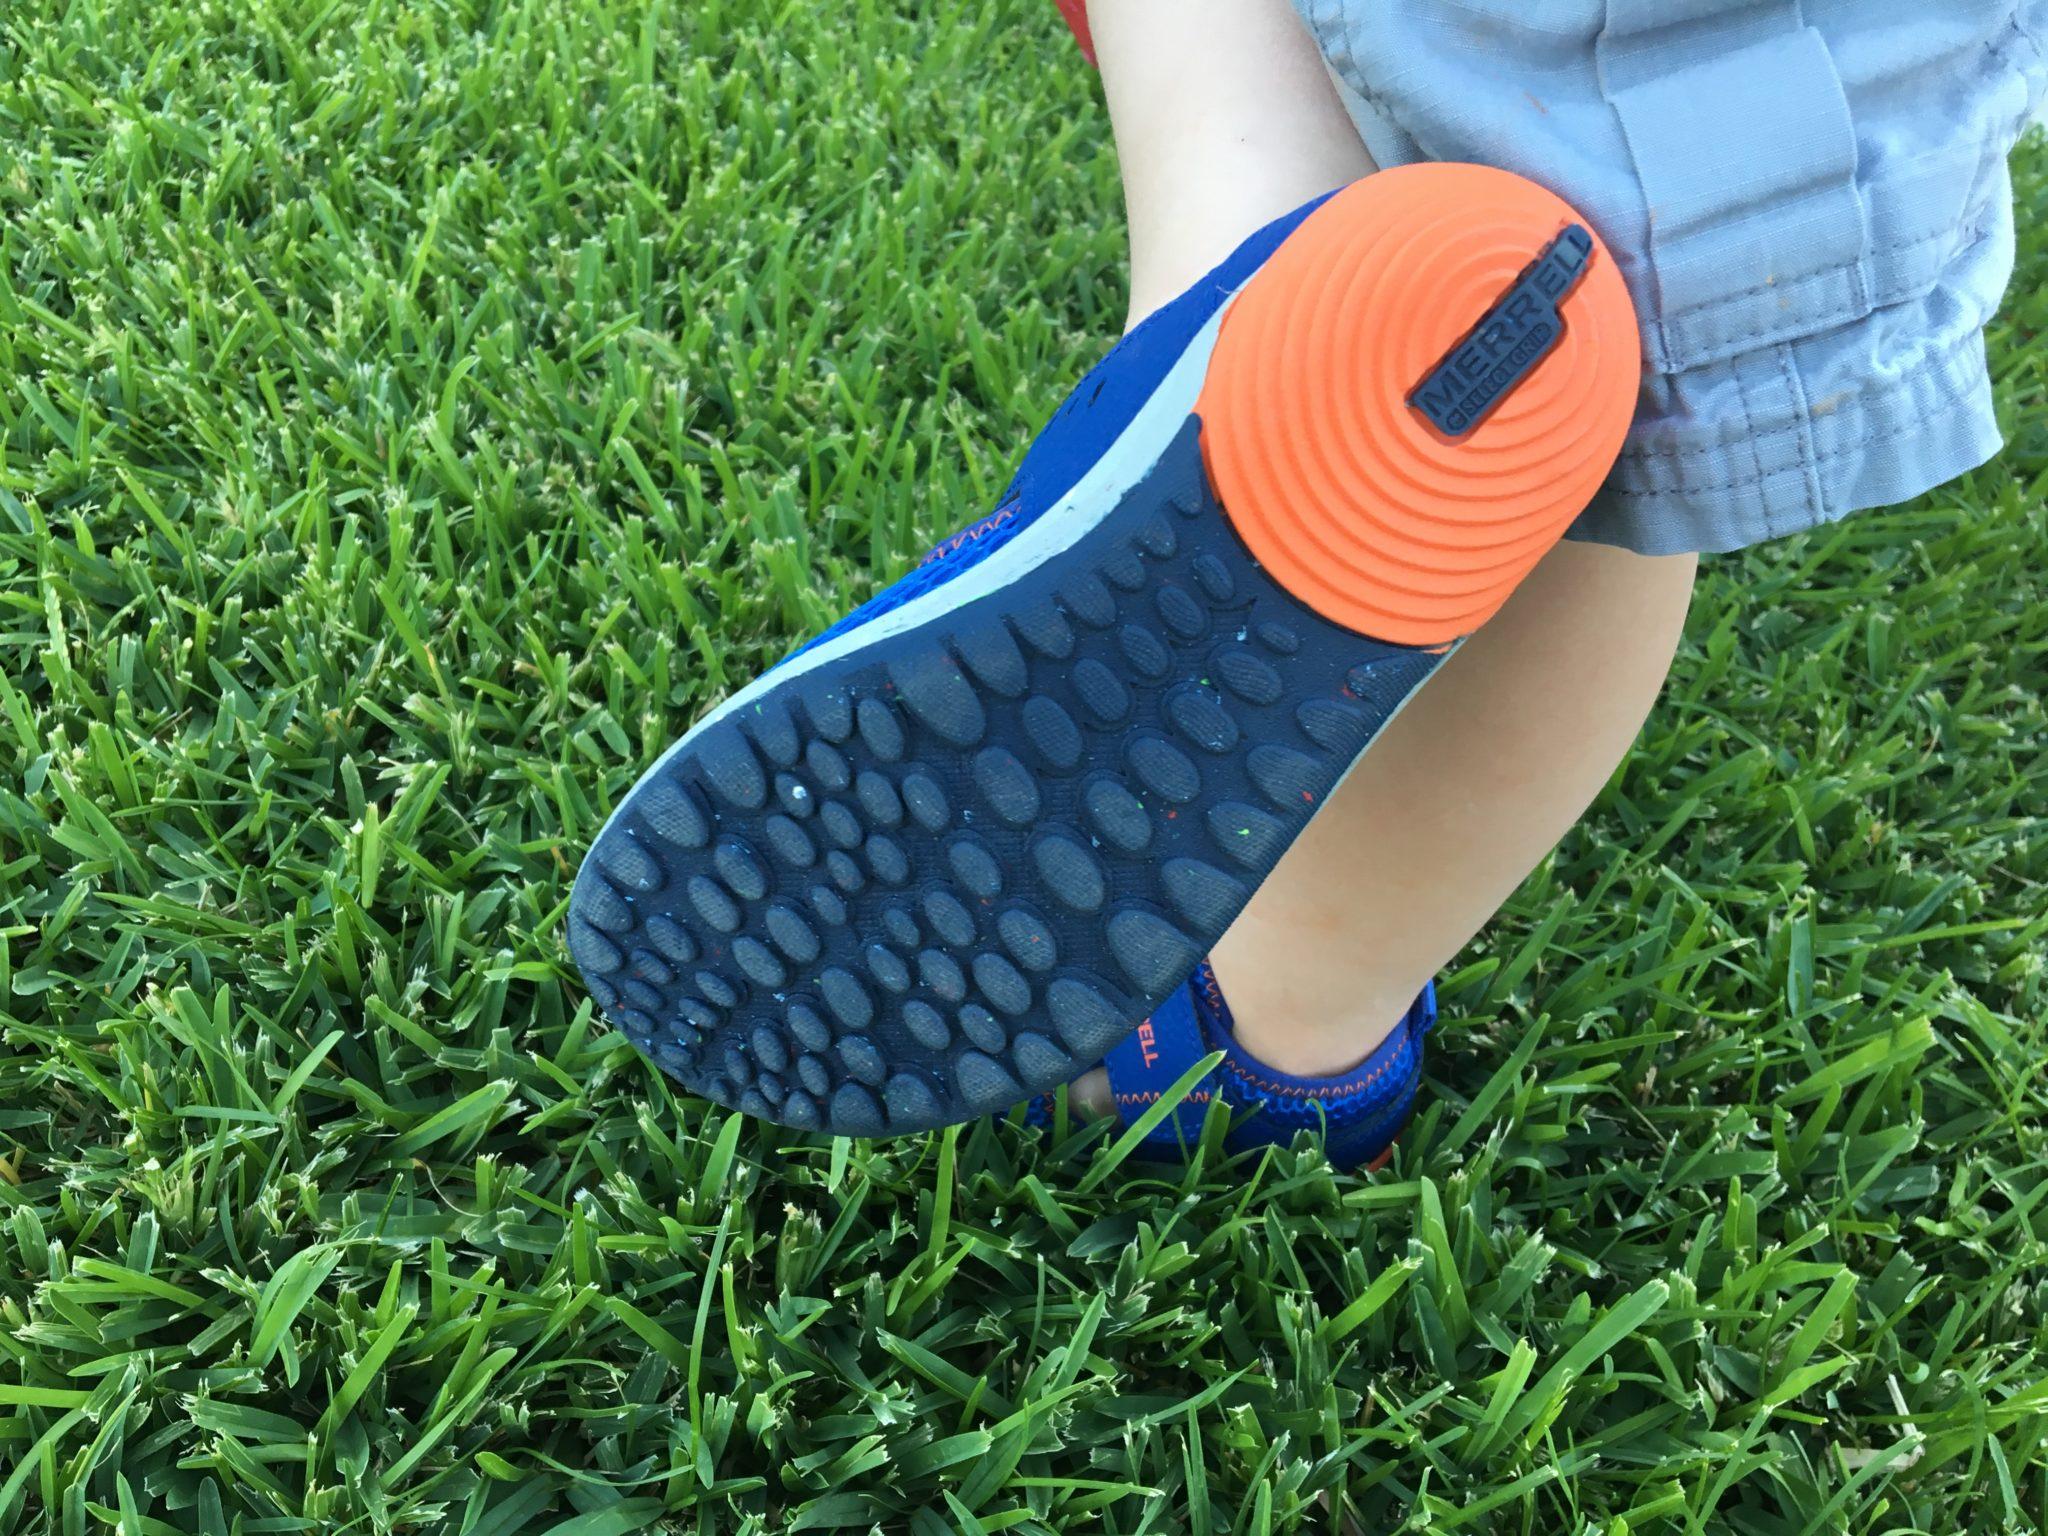 Multidirectional tread for a barefoot feel